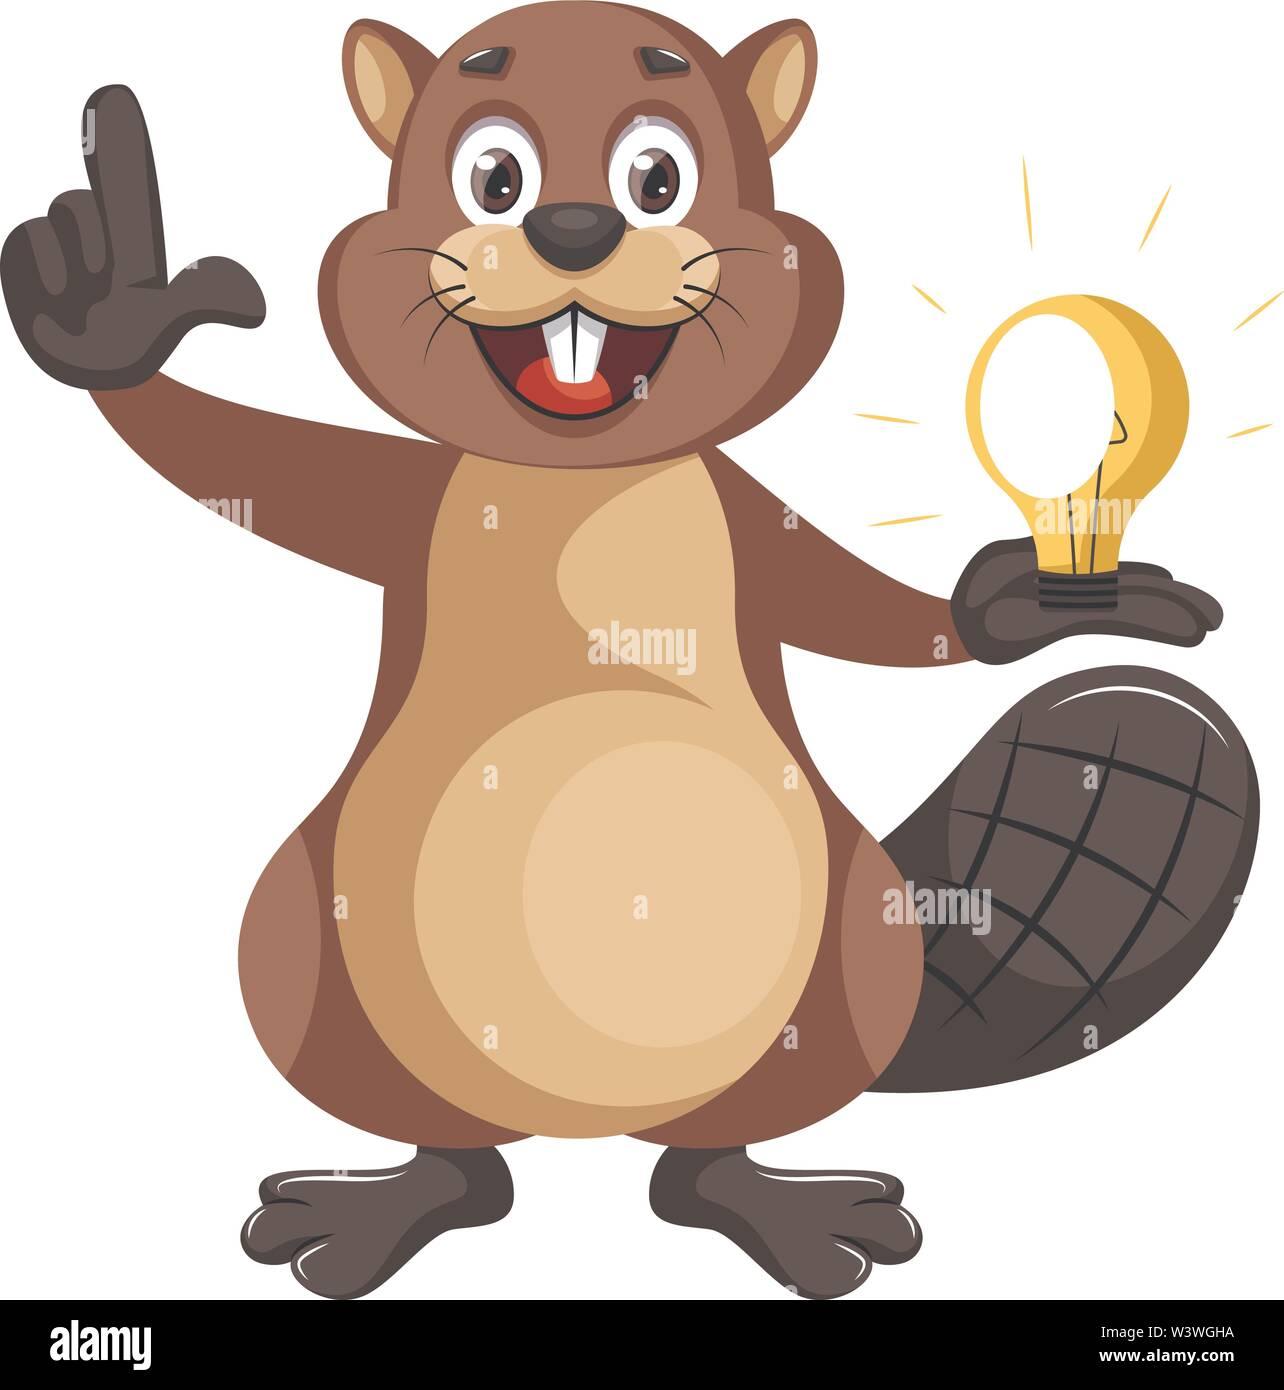 Beaver with lighting bulb, illustration, vector on white background. - Stock Image